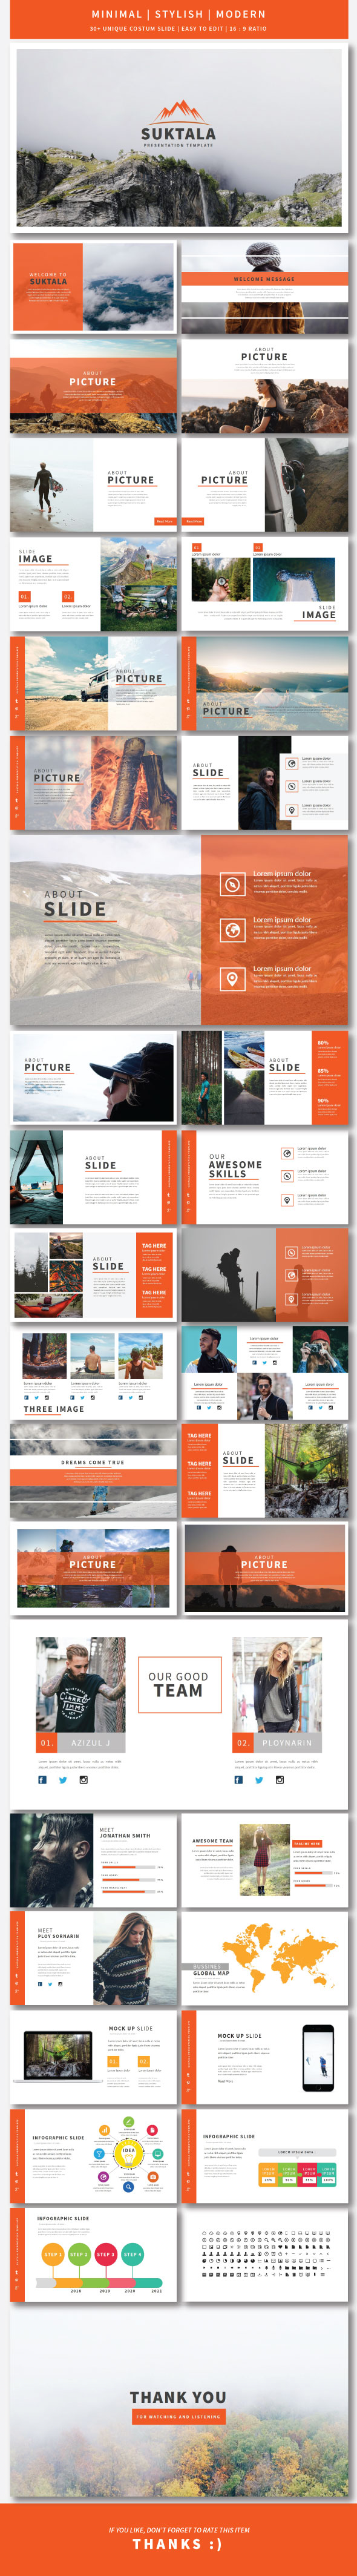 Suktala Google Slide Template - Google Slides Presentation Templates